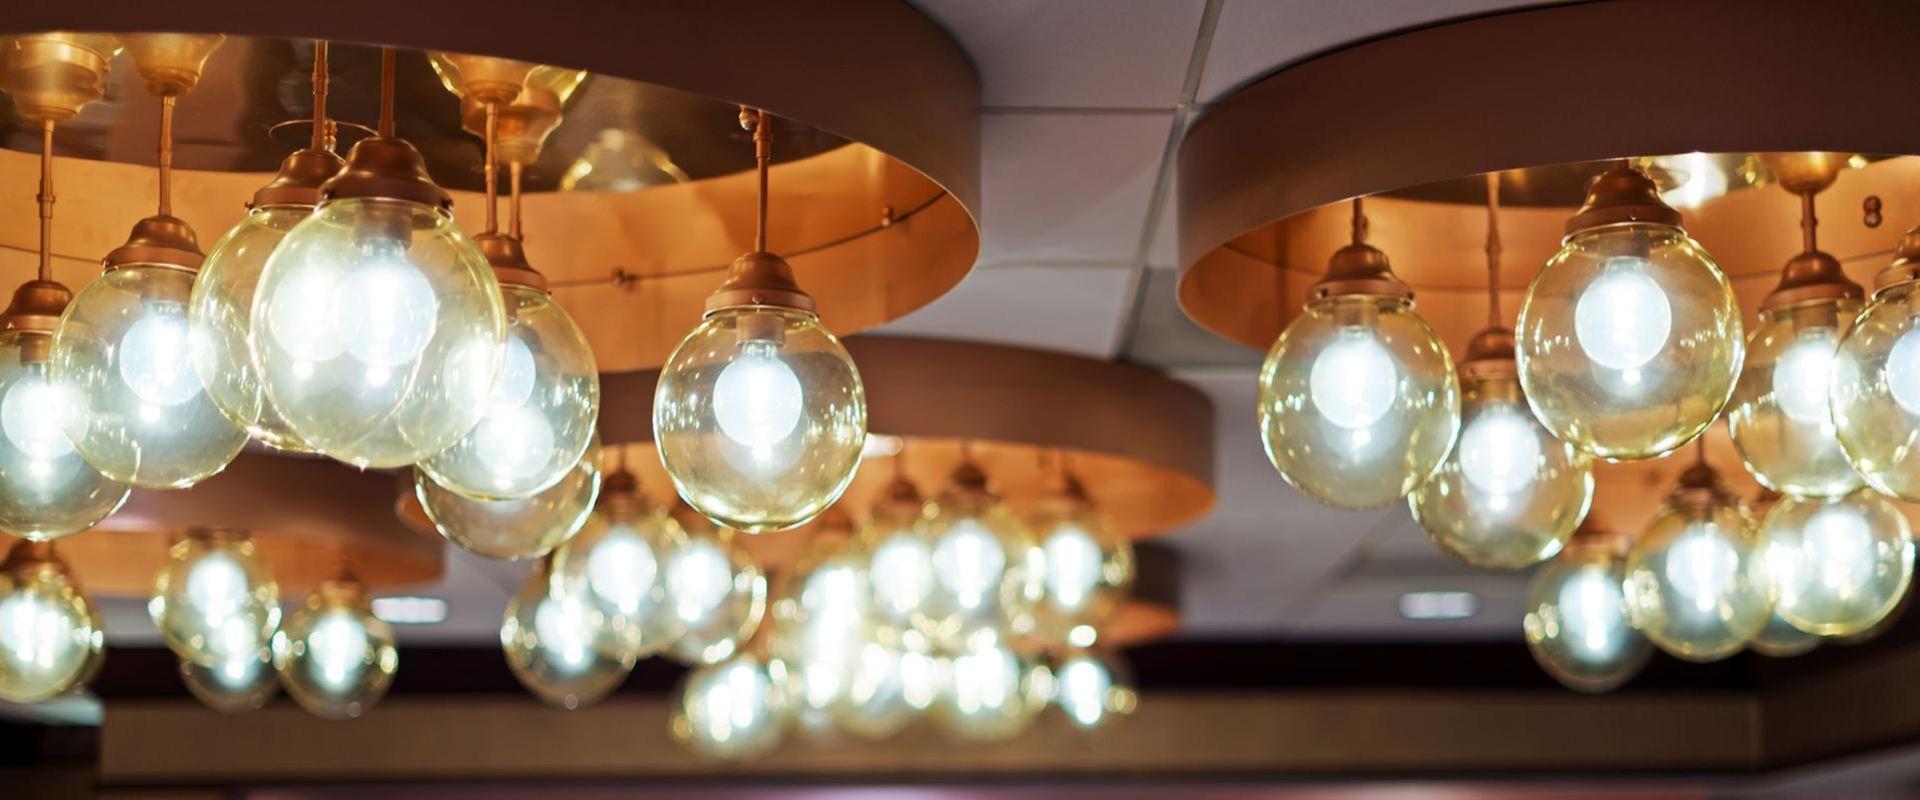 Atlanta Hotel Closeup of Restaurant Lighting